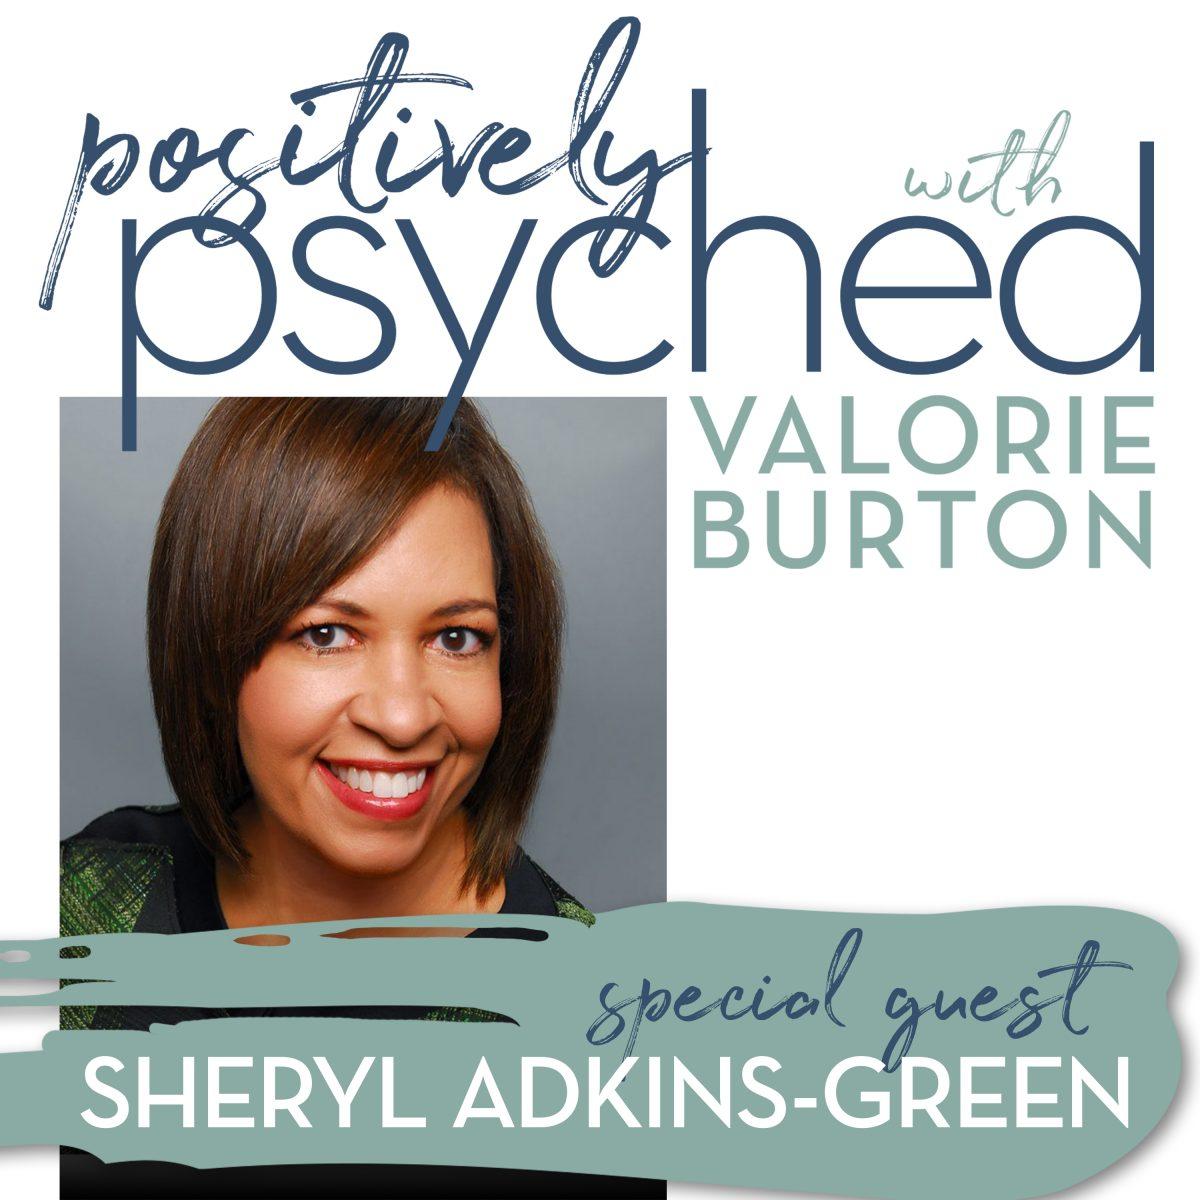 Sheryl Adkins-Green